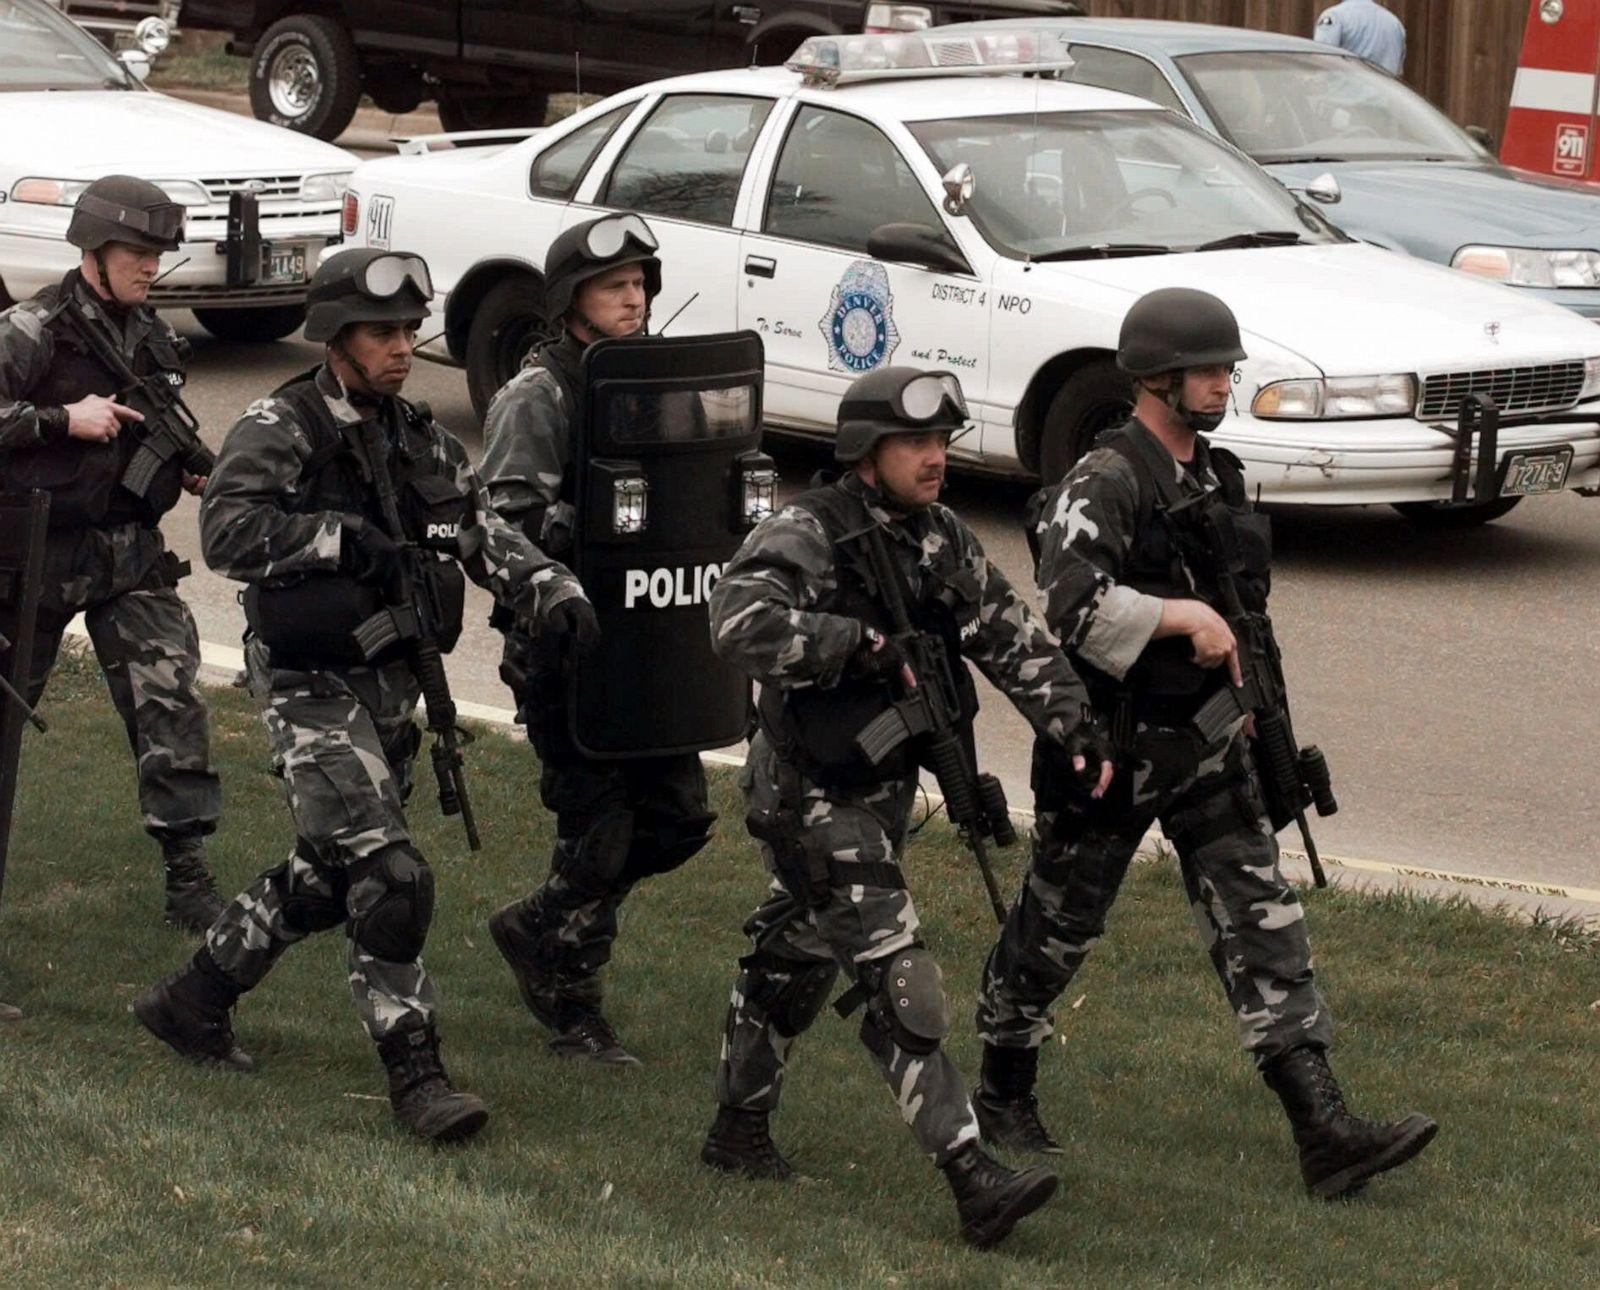 e9f2f2bdc9c65 20 years after Columbine